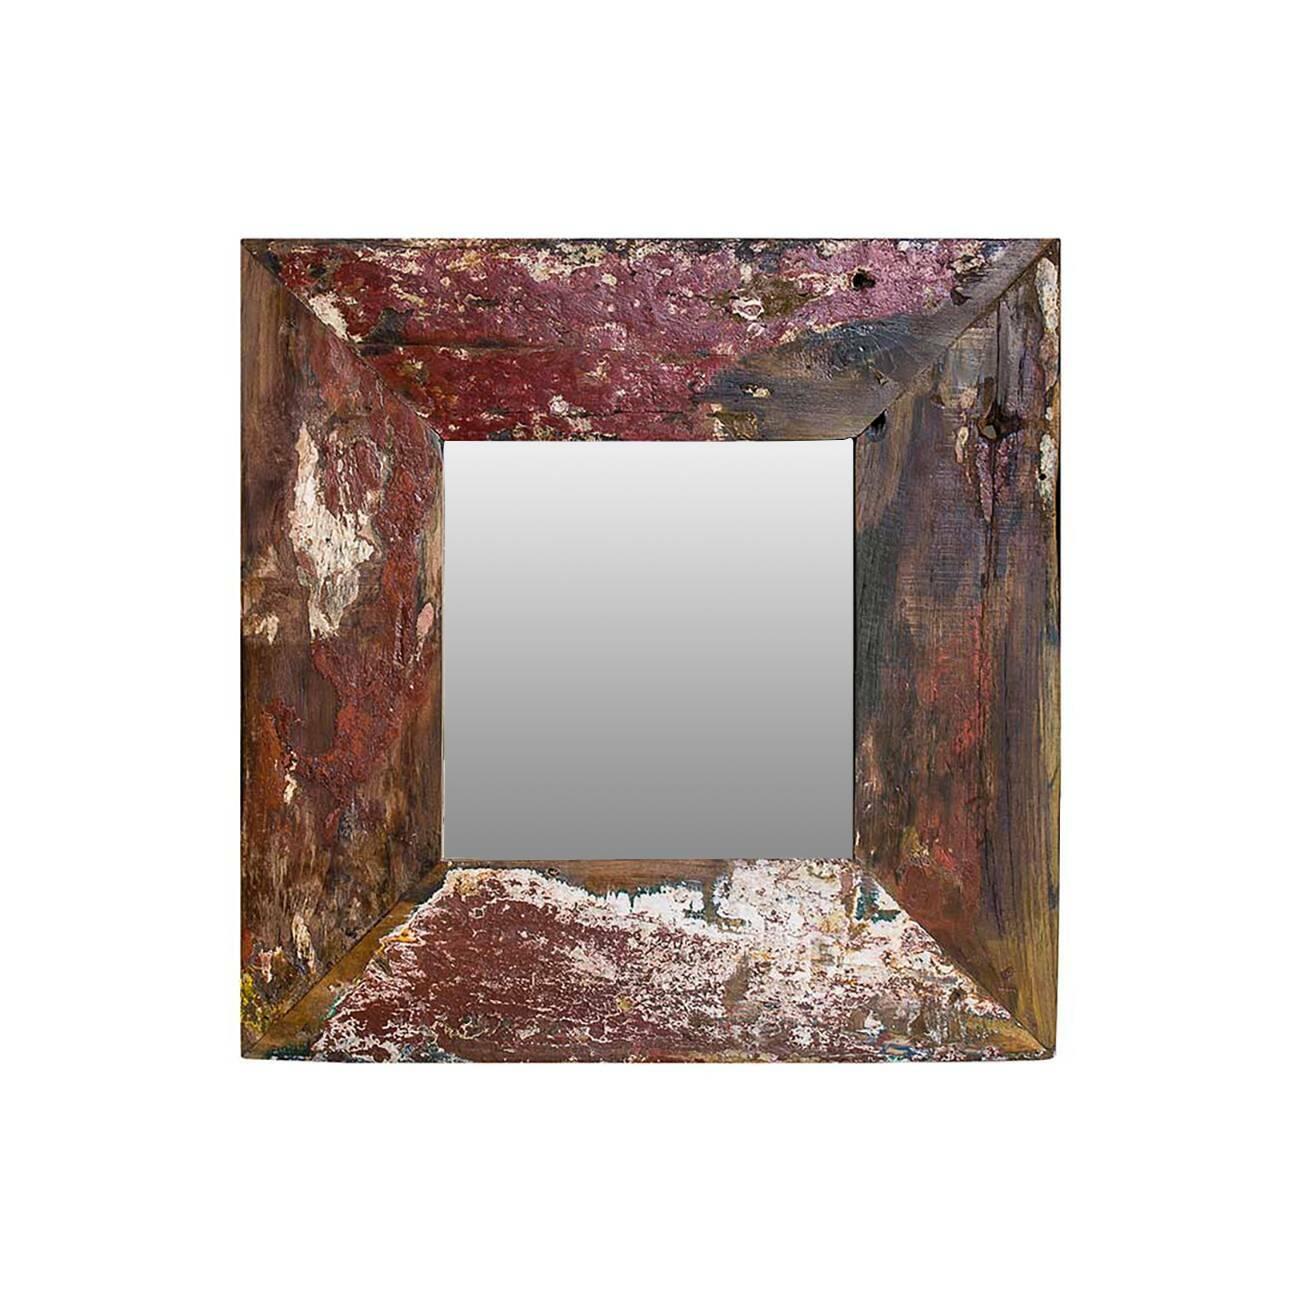 Зеркало Like Lodka 15576224 от Cosmorelax